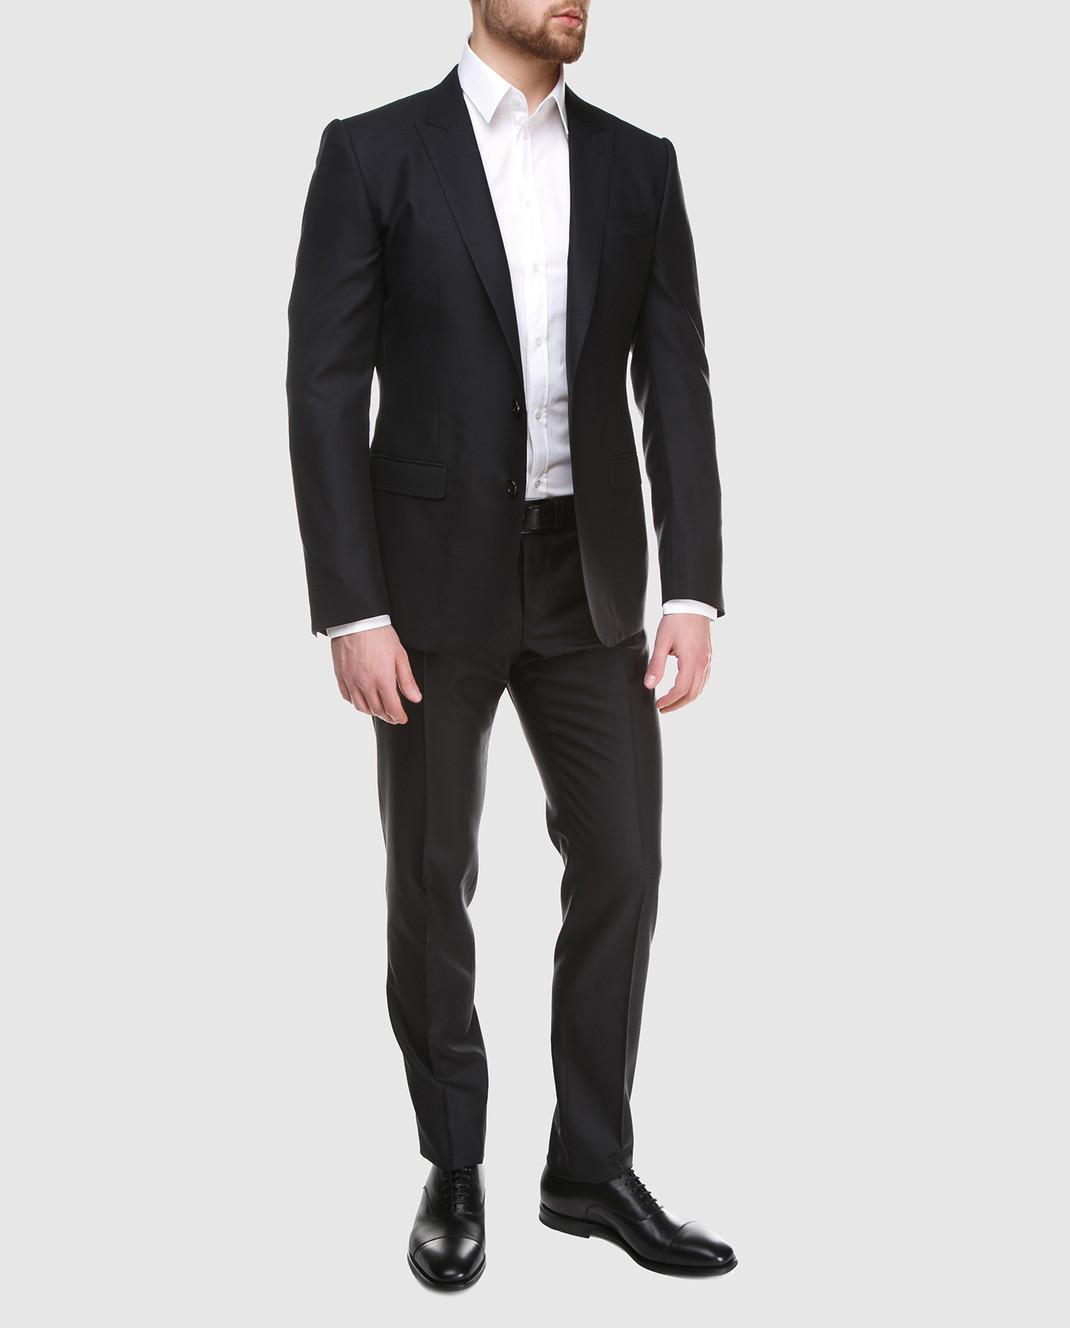 Dolce&Gabbana Черный костюм GK0RMTFU3N0 изображение 2